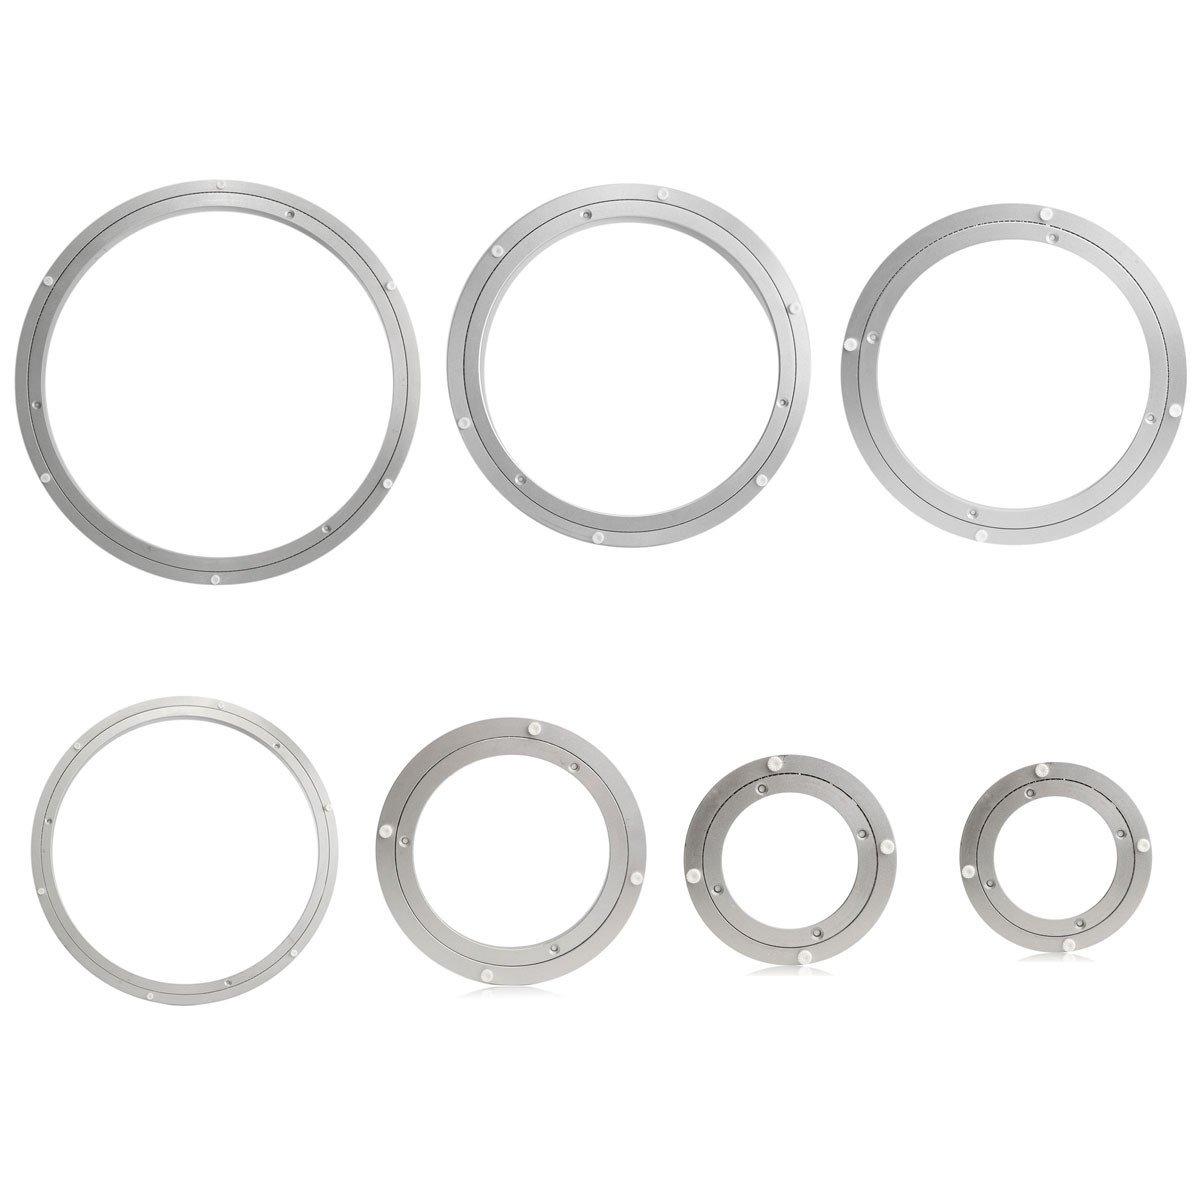 rotatif Roulement platine, Lovinn rotatif en aluminium robuste Roulement platine Turn Table ronde Assiette Vaisselle